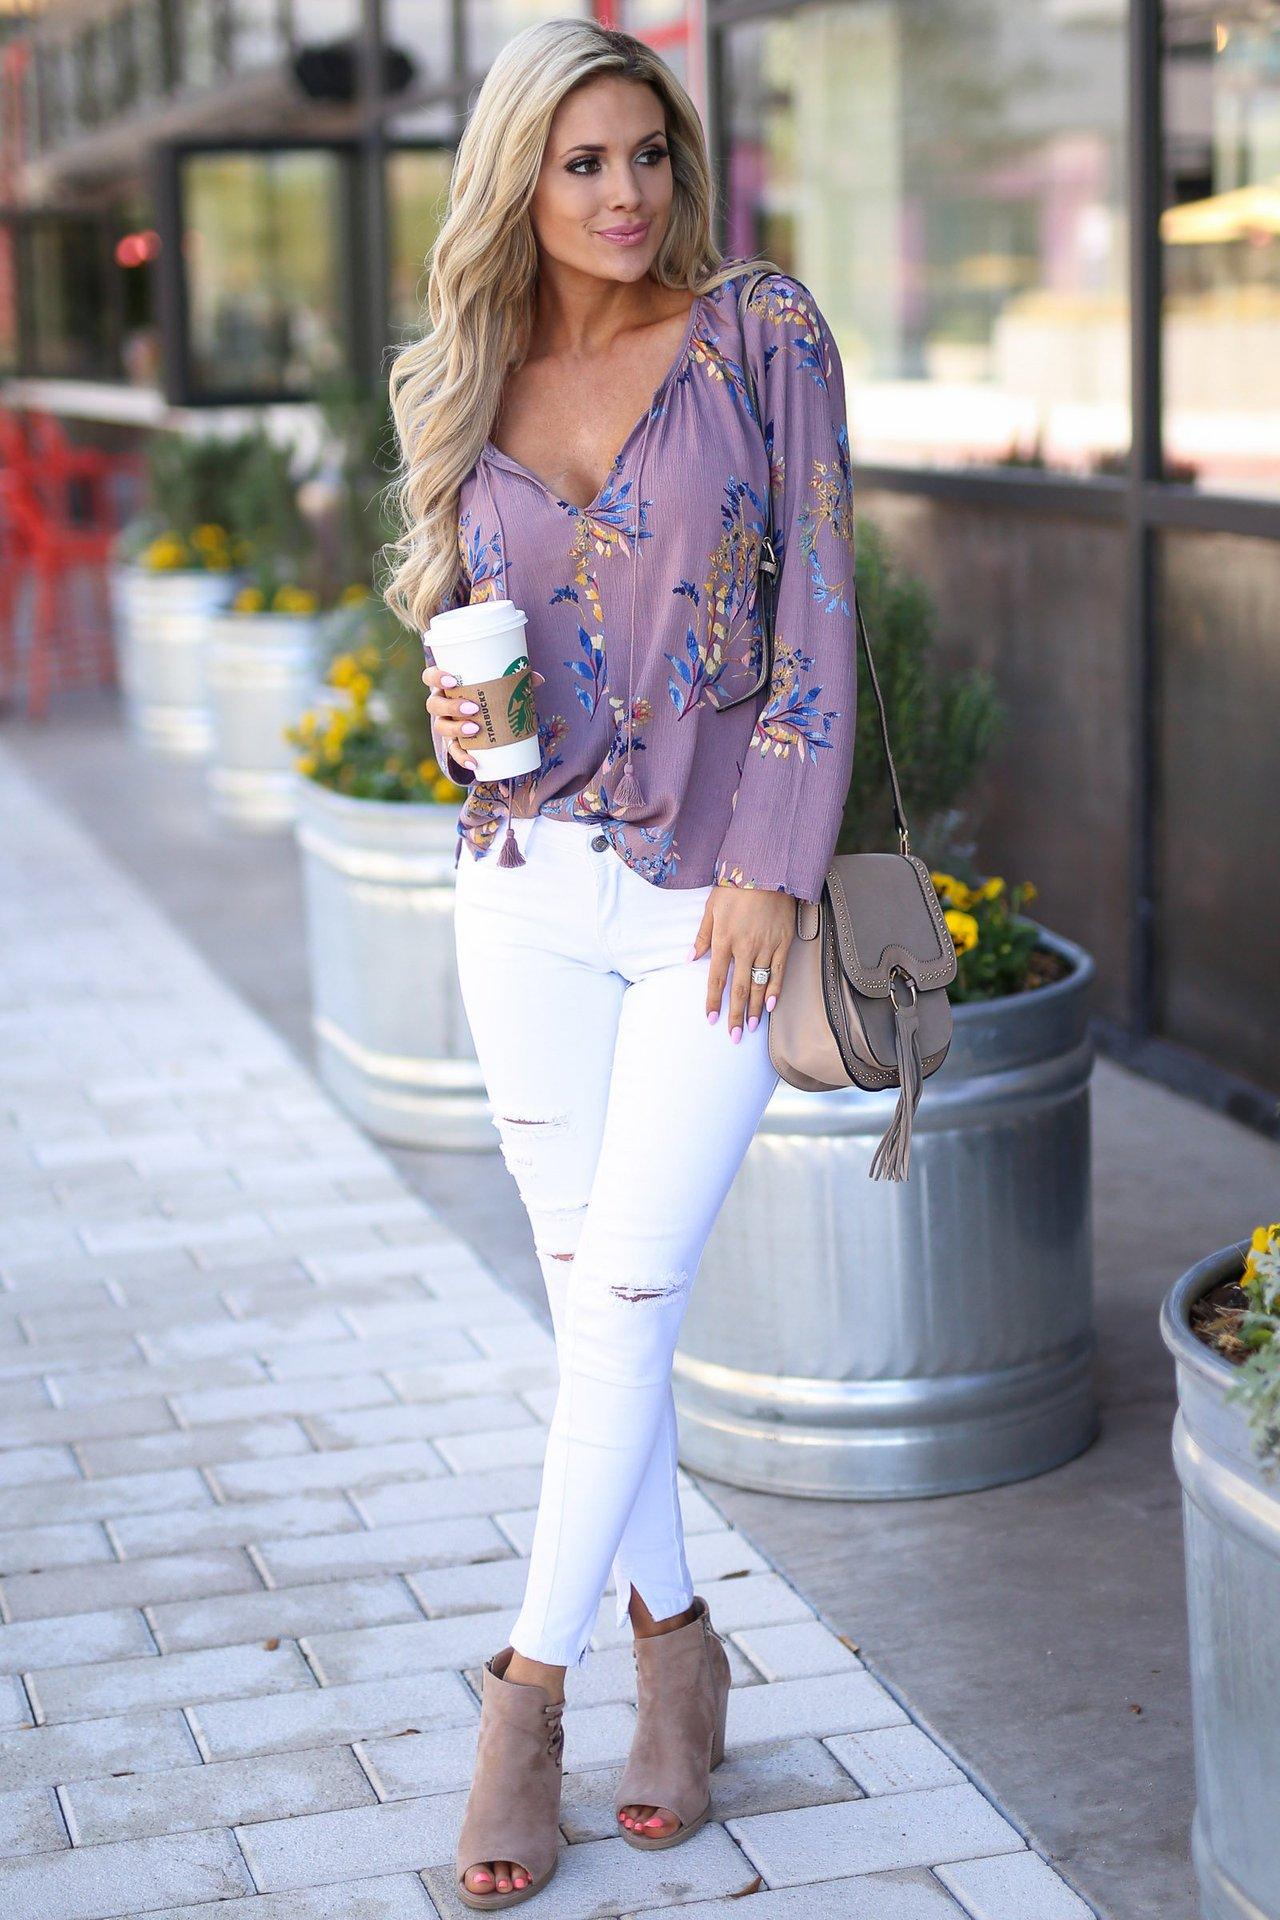 blouse plus size women harajuku woman clothes floral print shirts korean top fashion mama 2020 summer office lady gothic